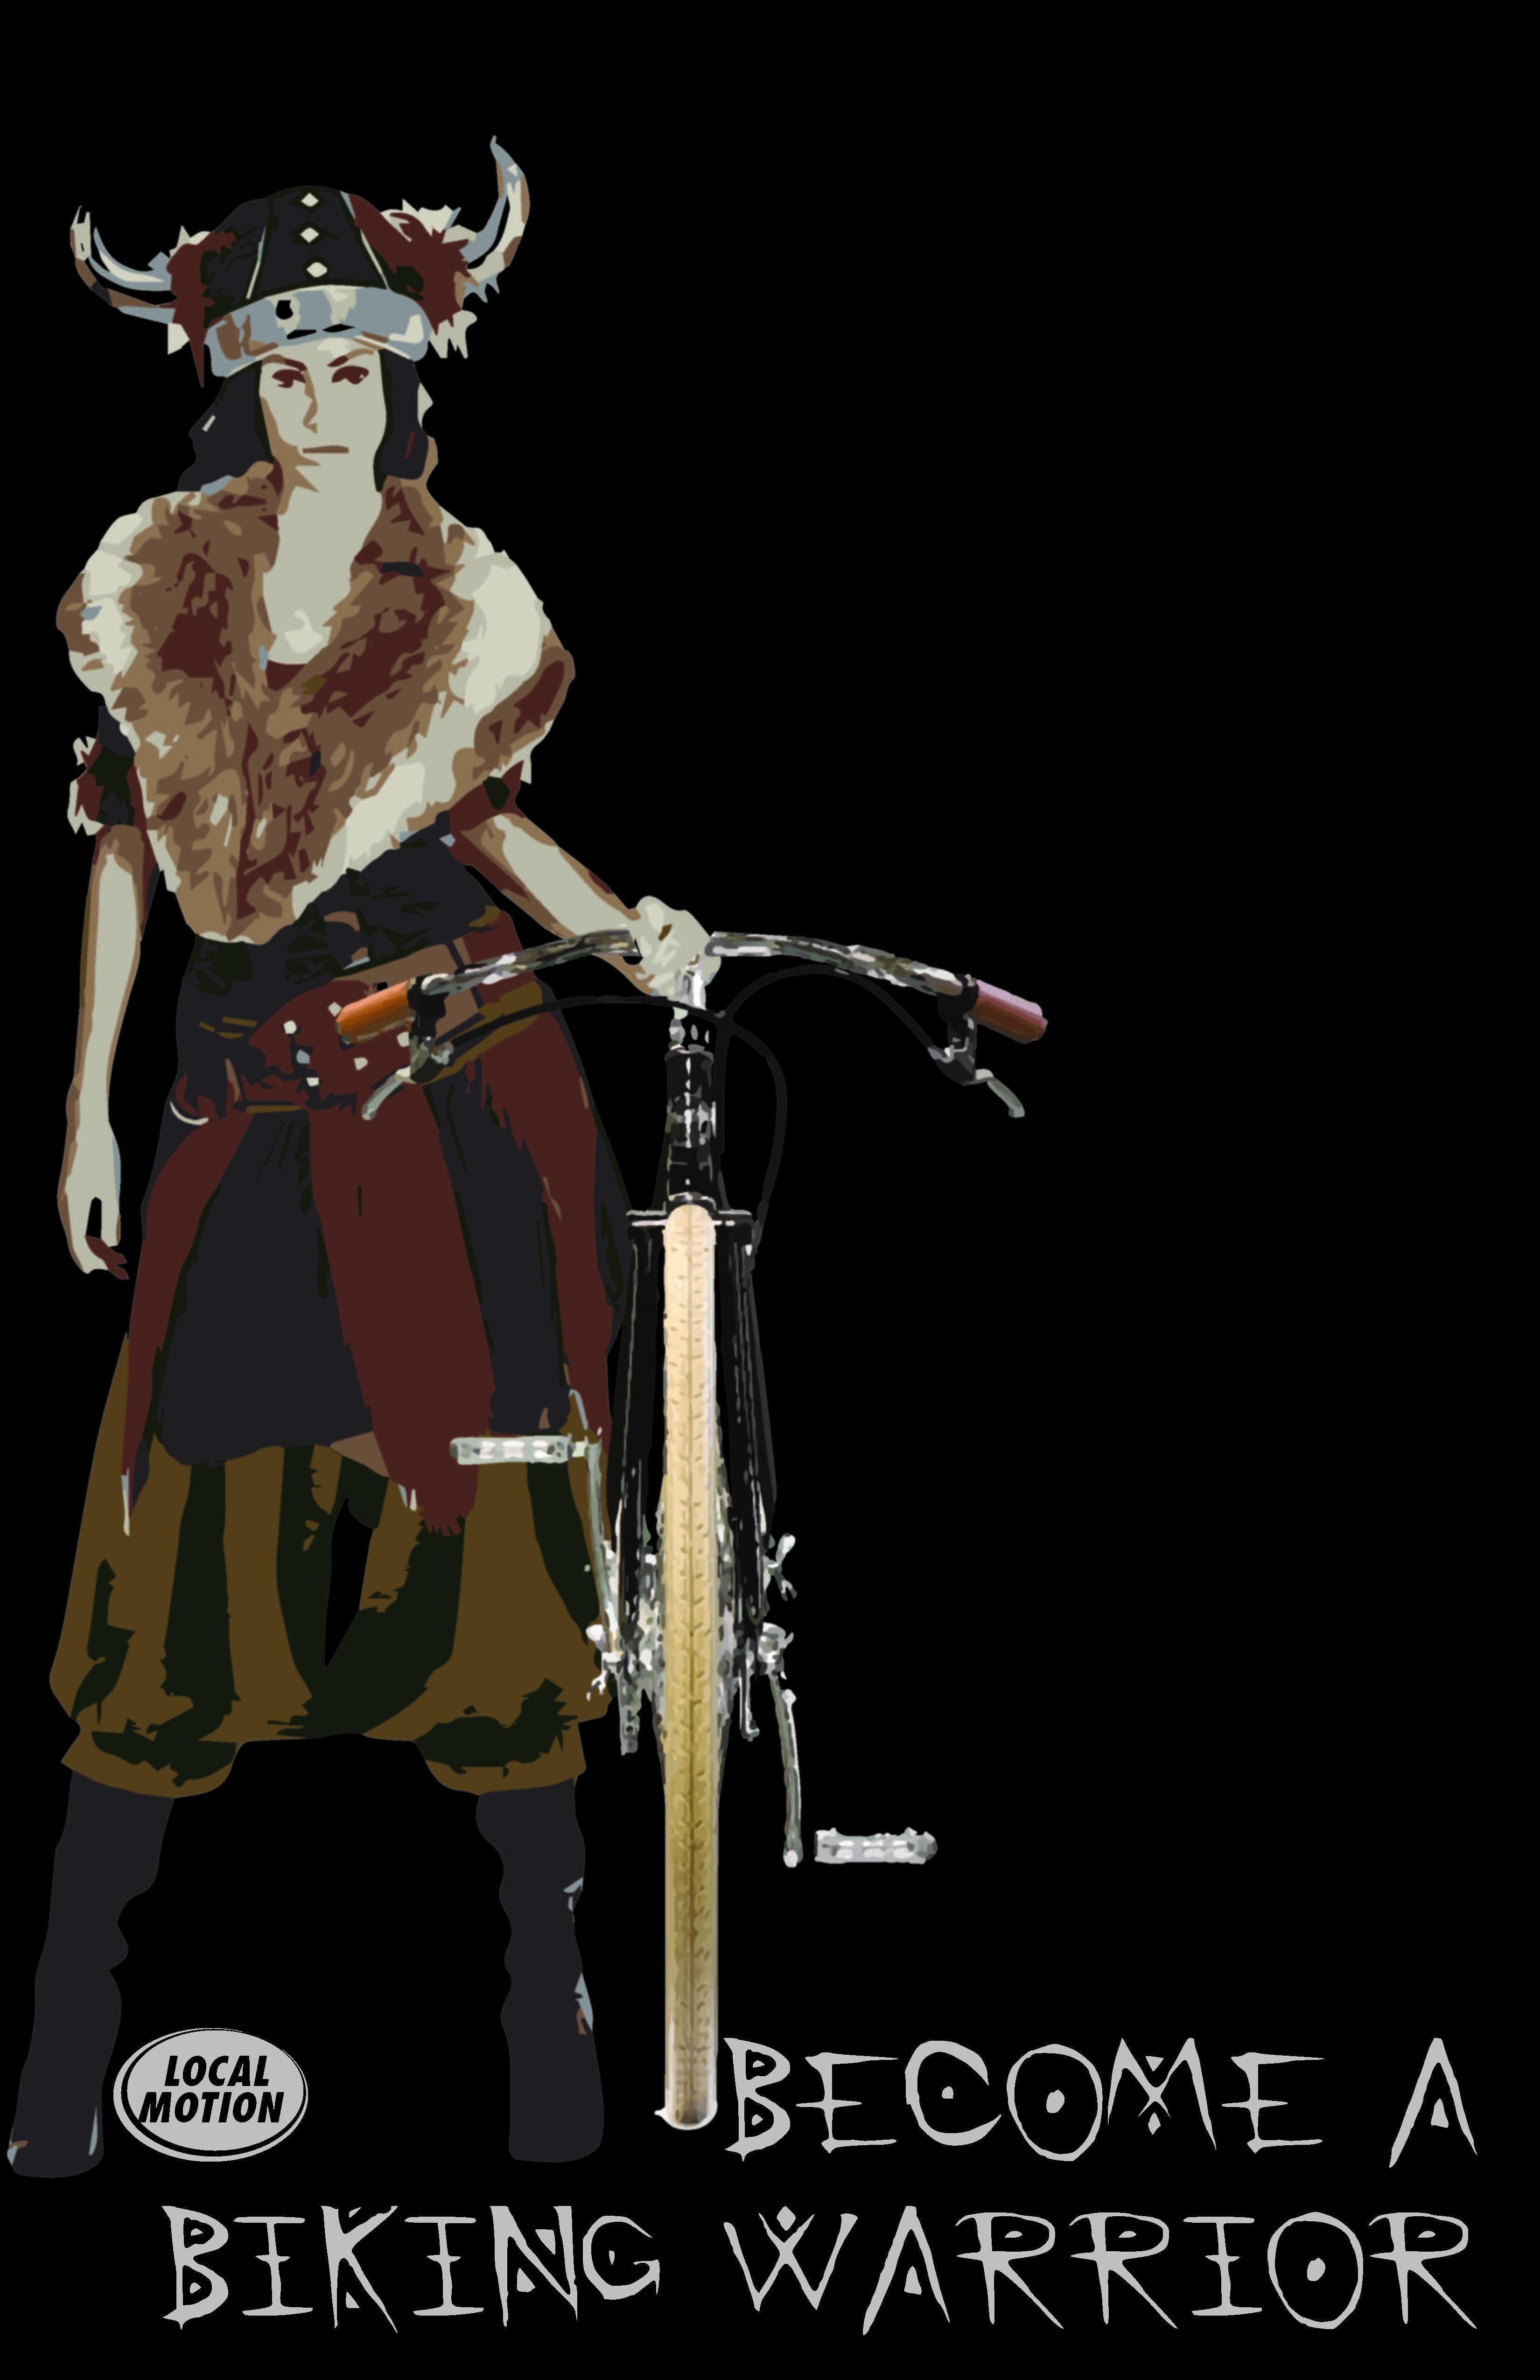 biking_warrior_lady_furs.jpg